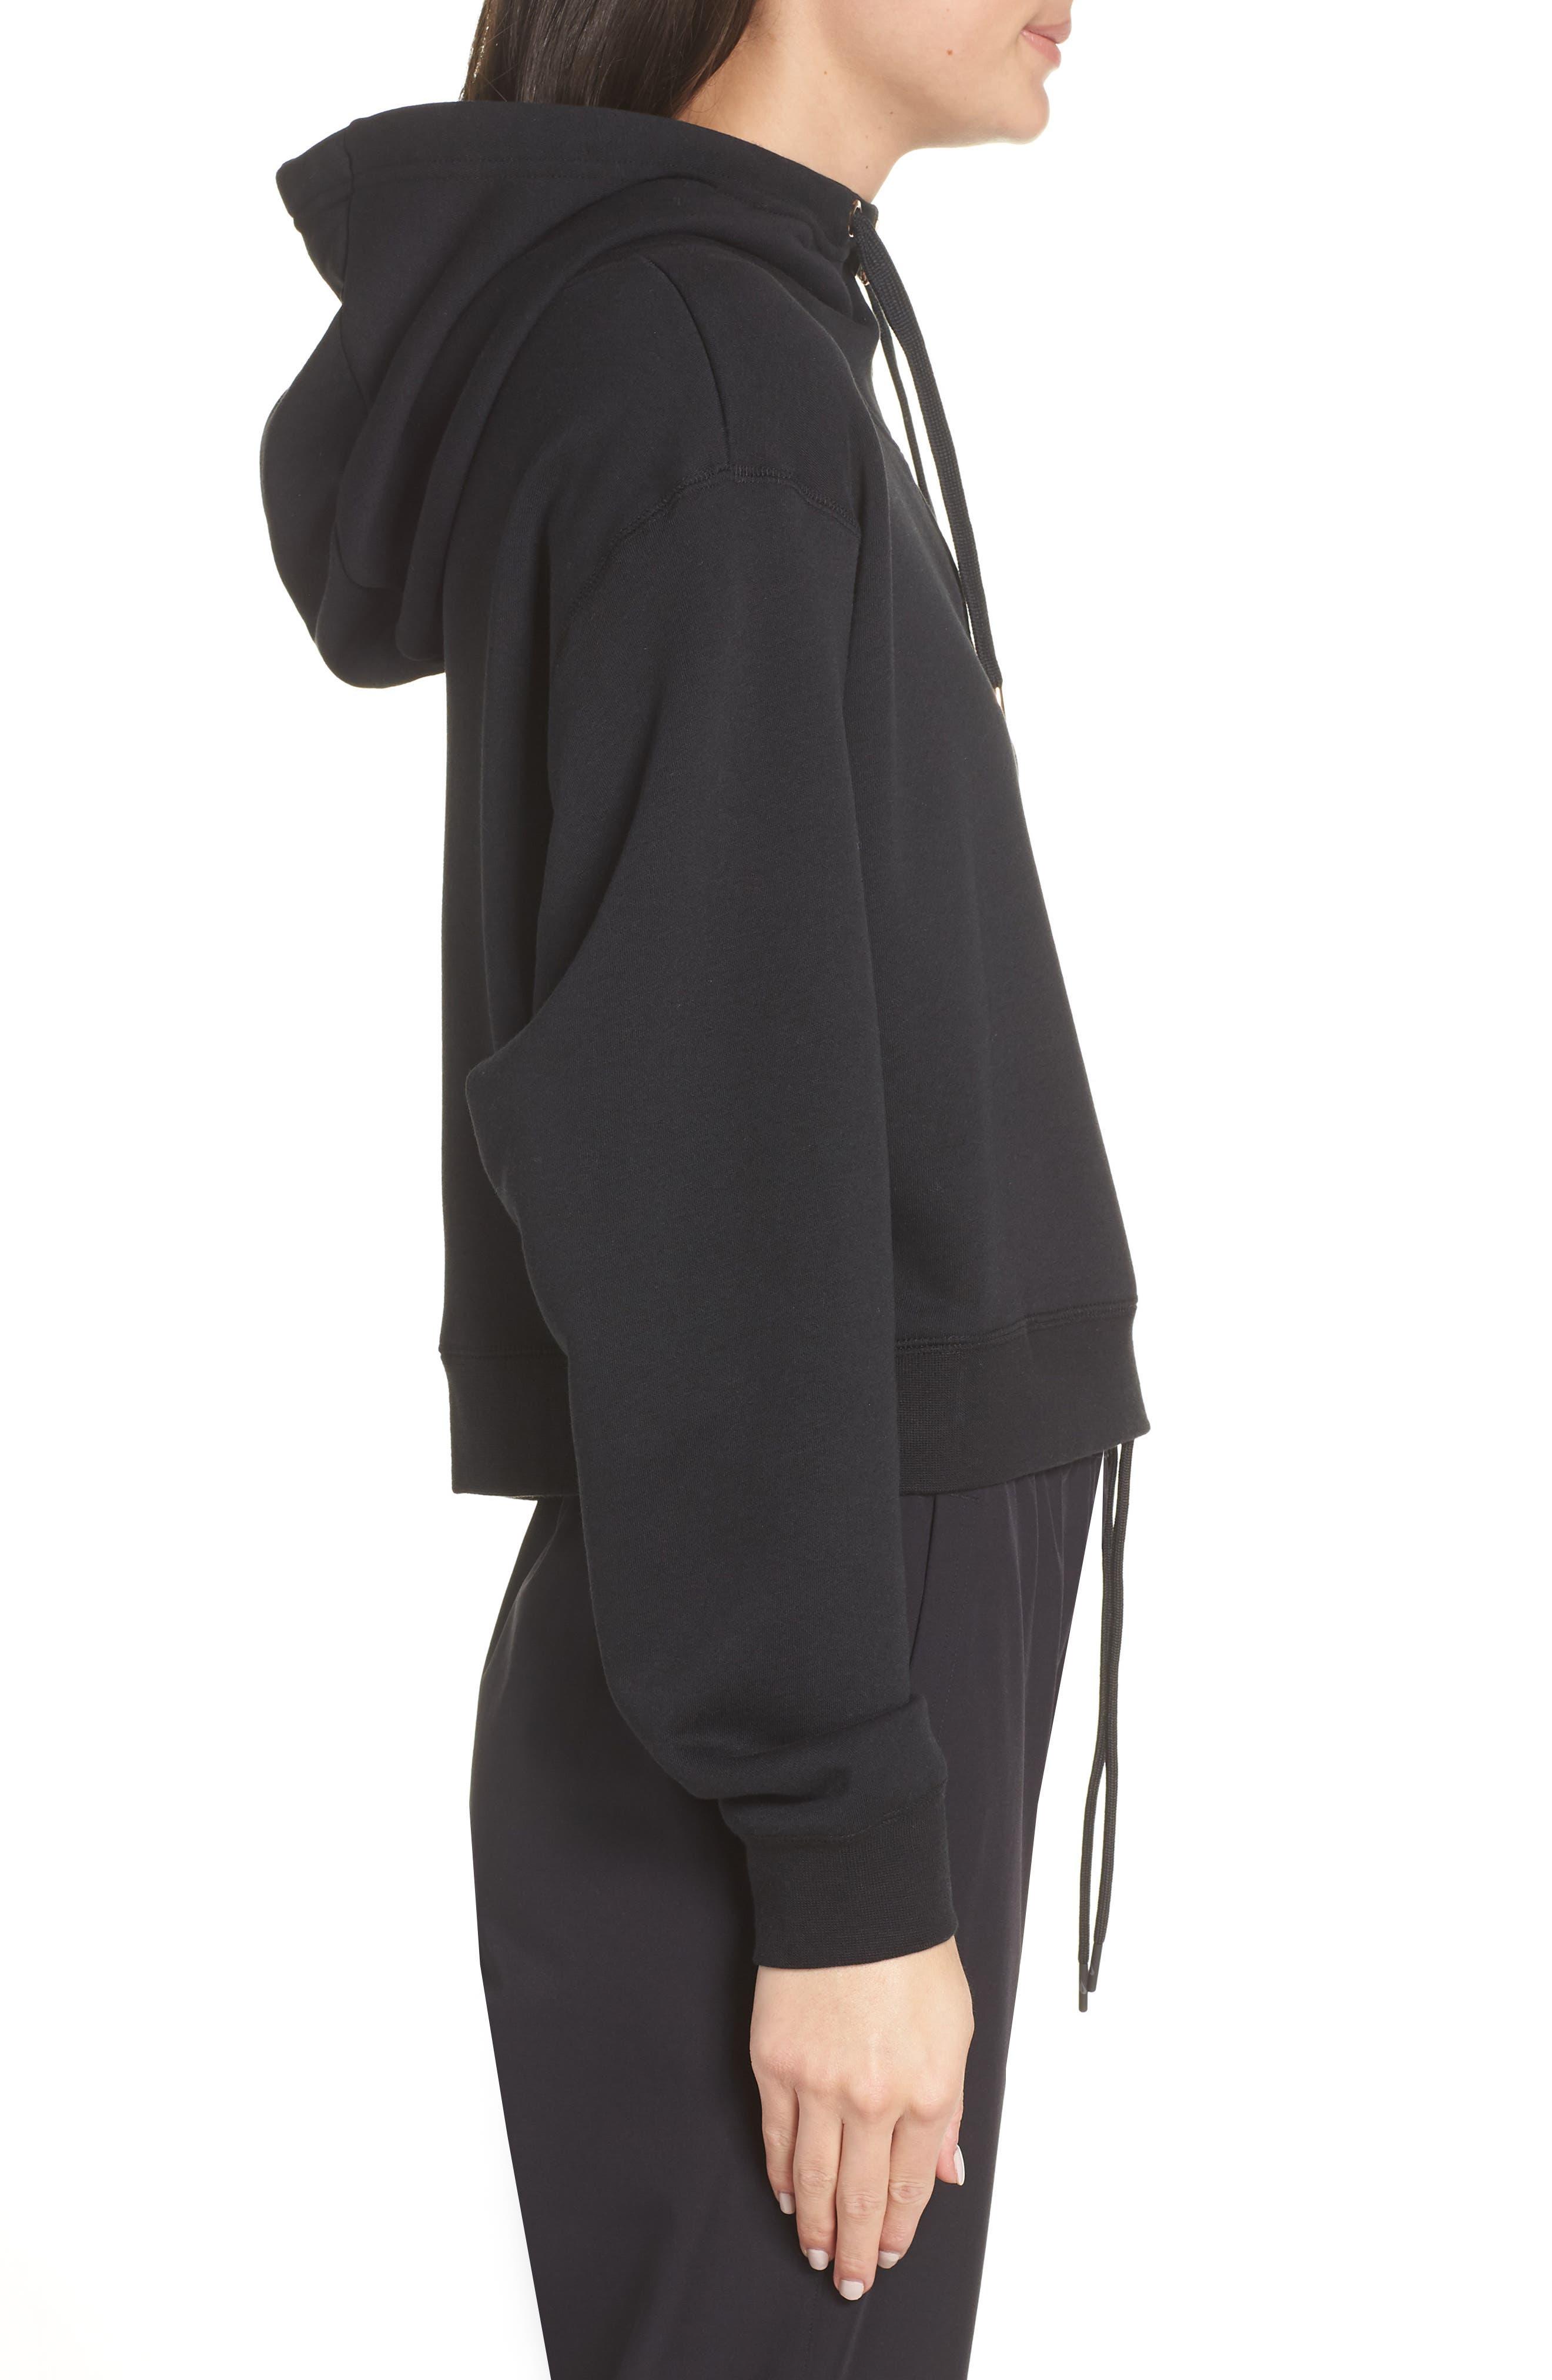 Sportswear Women's Half Zip Fleece Hoodie,                             Alternate thumbnail 3, color,                             BLACK/ BLACK/ ROSE GOLD